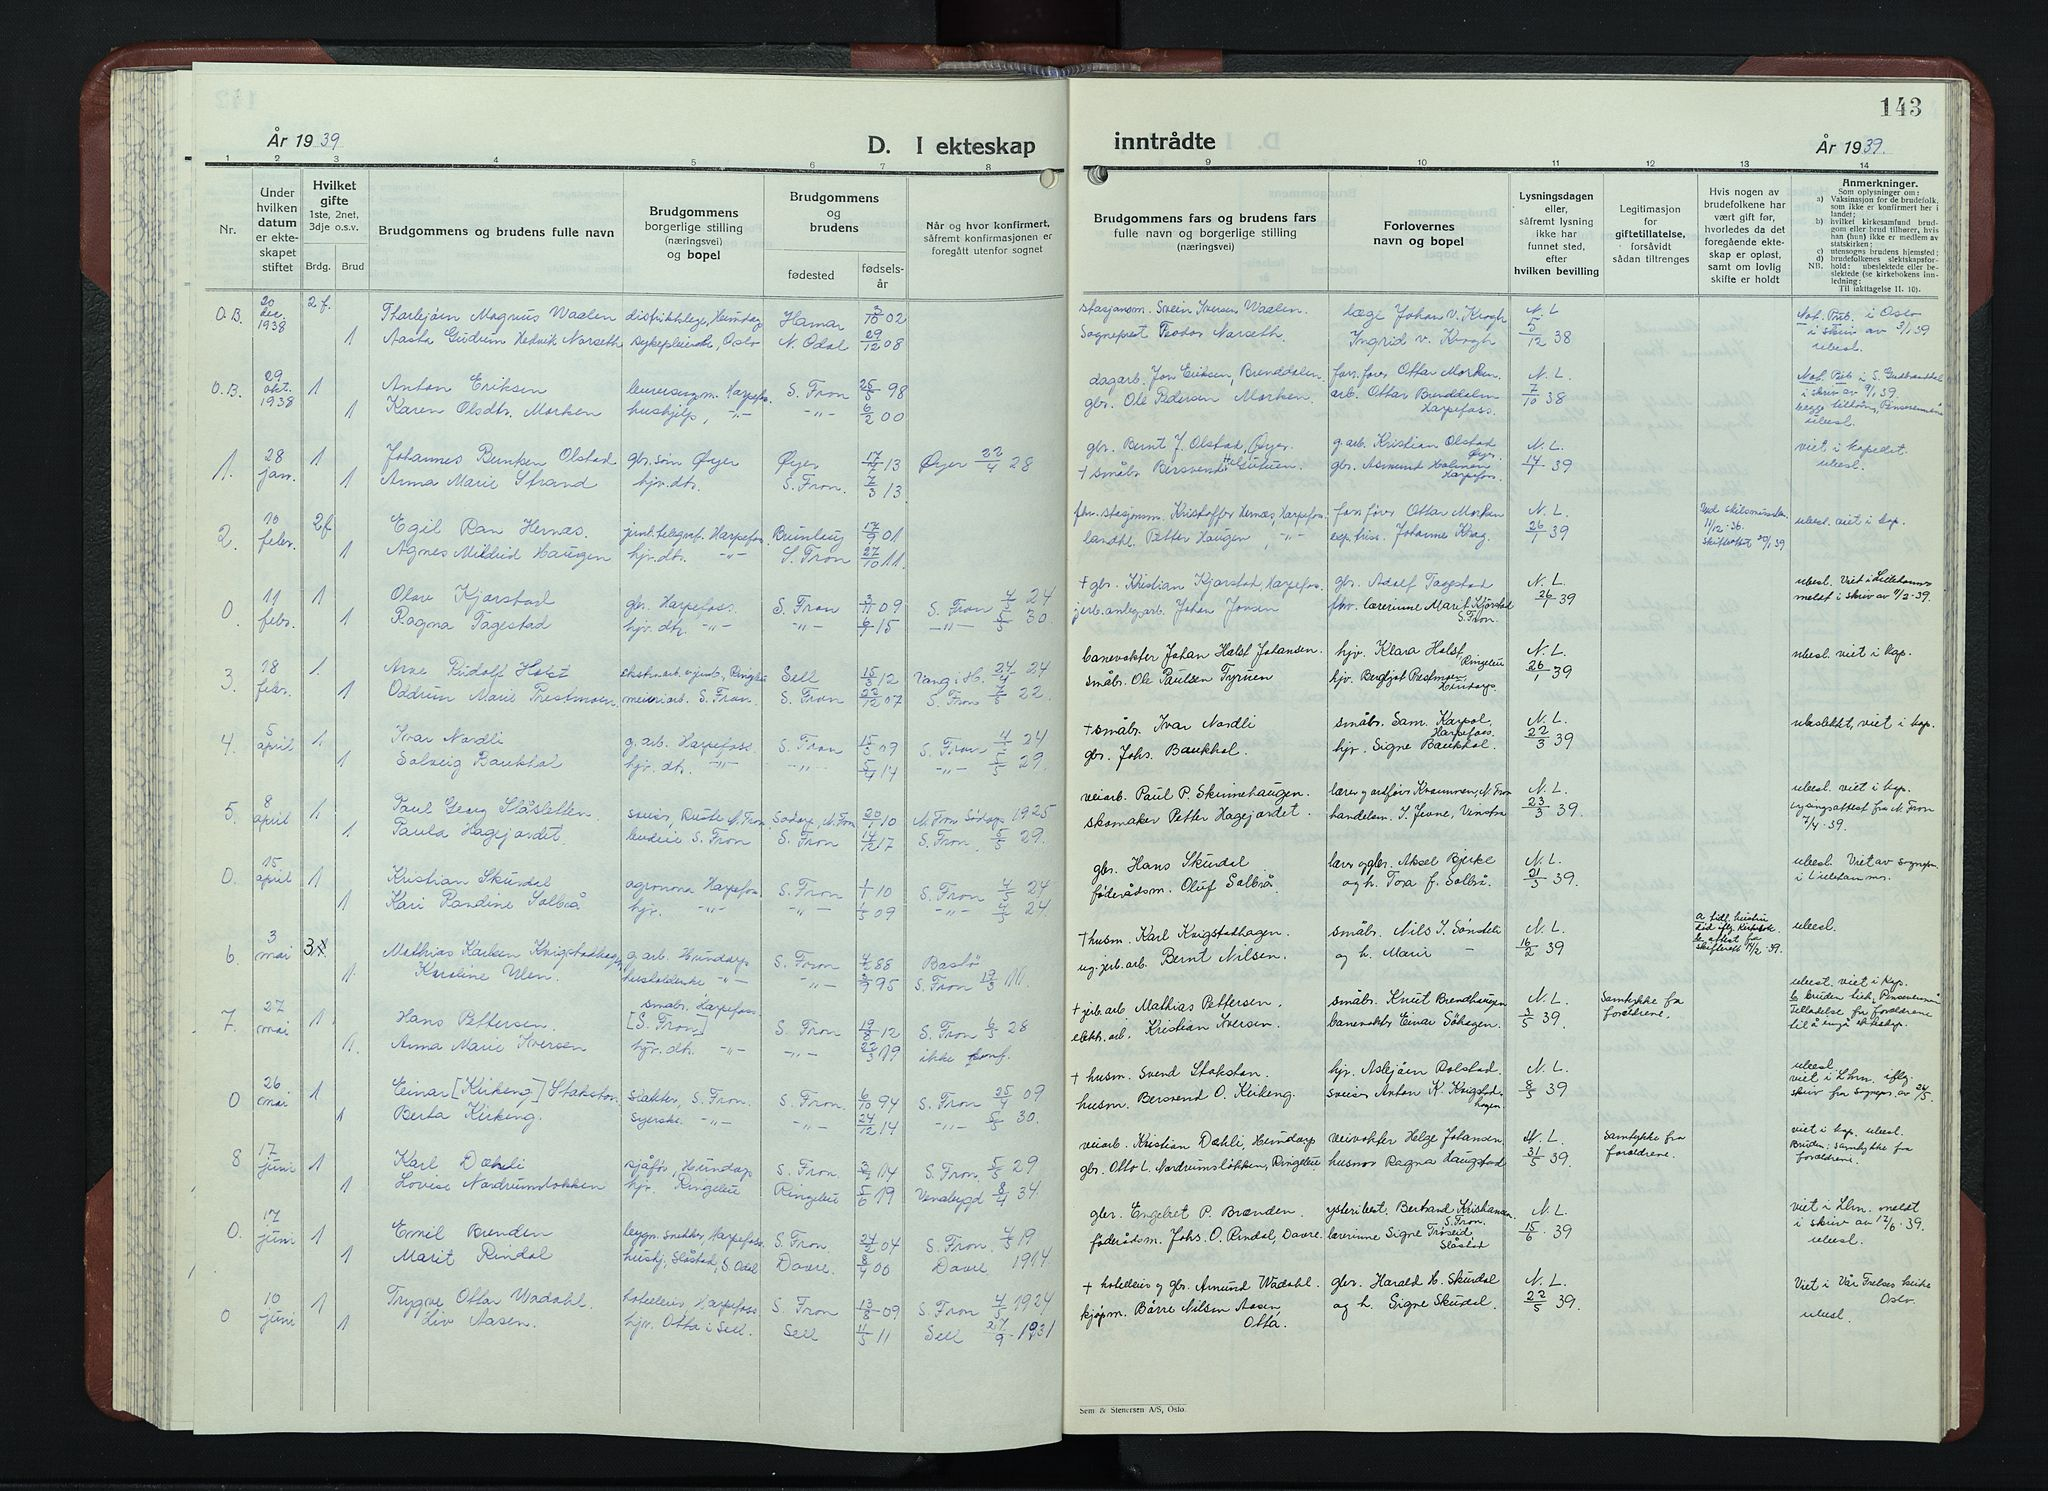 SAH, Sør-Fron prestekontor, H/Ha/Hab/L0006: Klokkerbok nr. 6, 1933-1948, s. 143